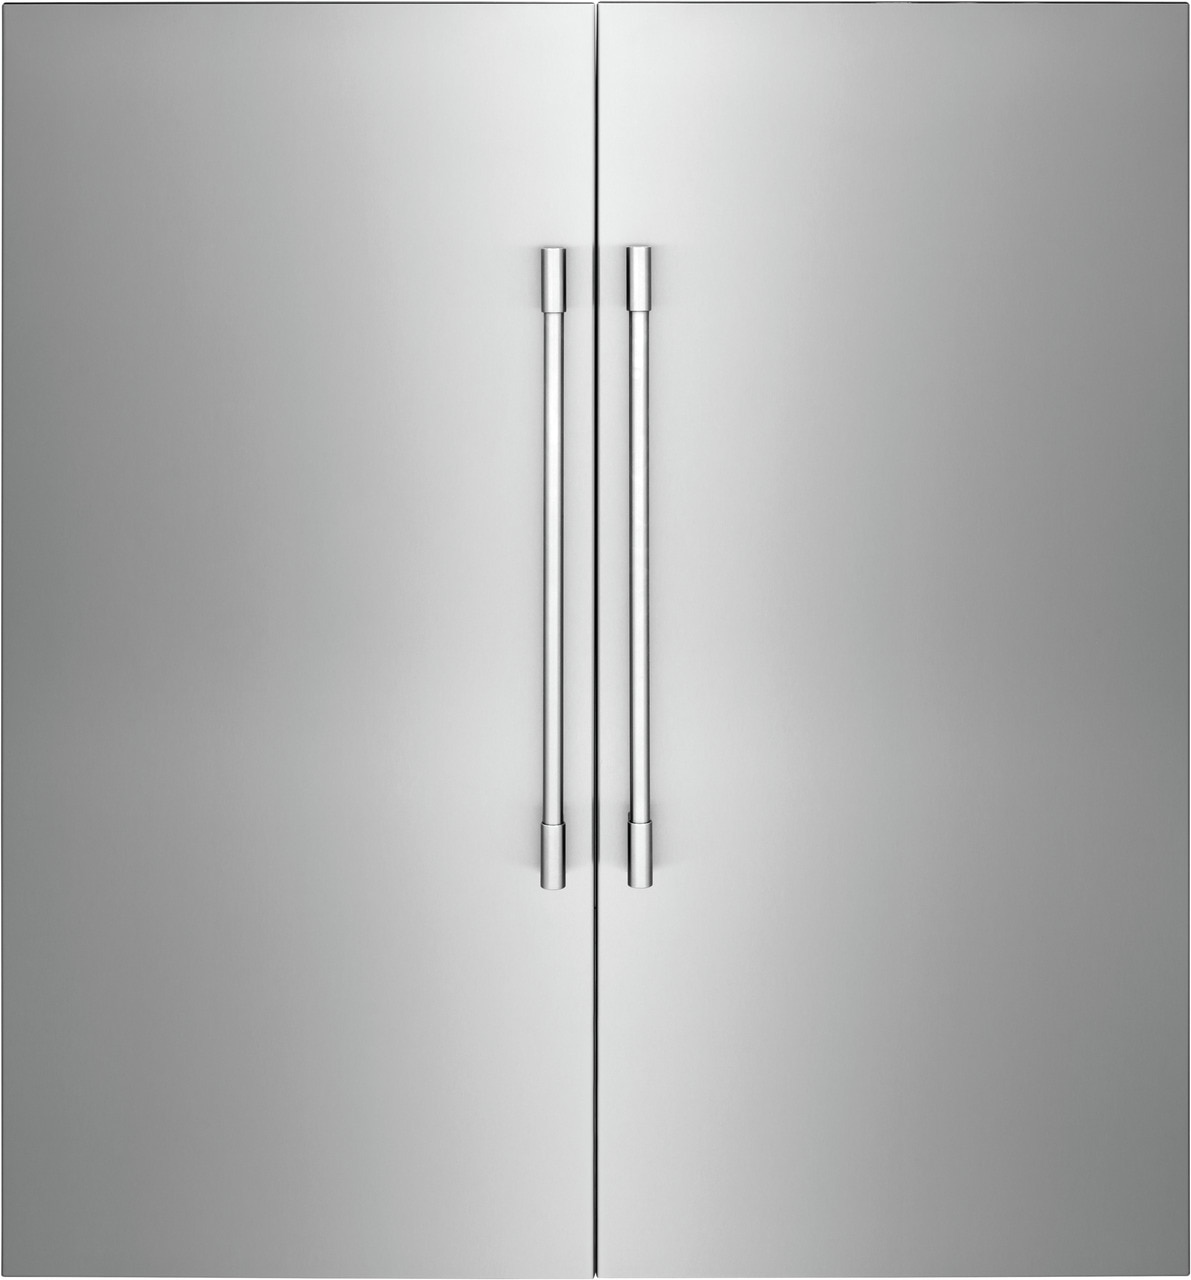 Model: FPFU19F8WF | Frigidaire Professional 19 Cu. Ft. Single-Door Freezer